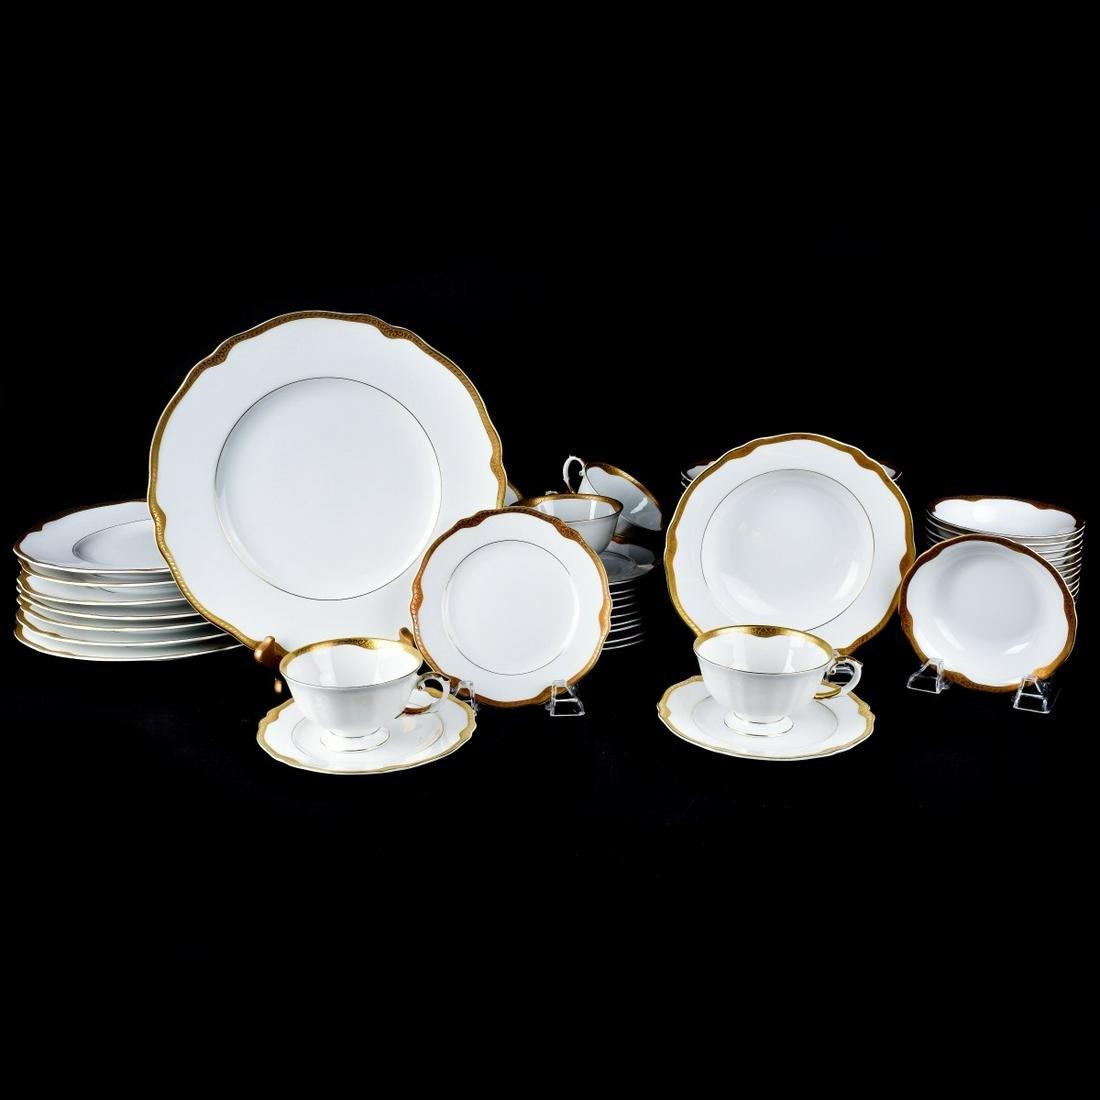 Franconia Jewel Dinnerware